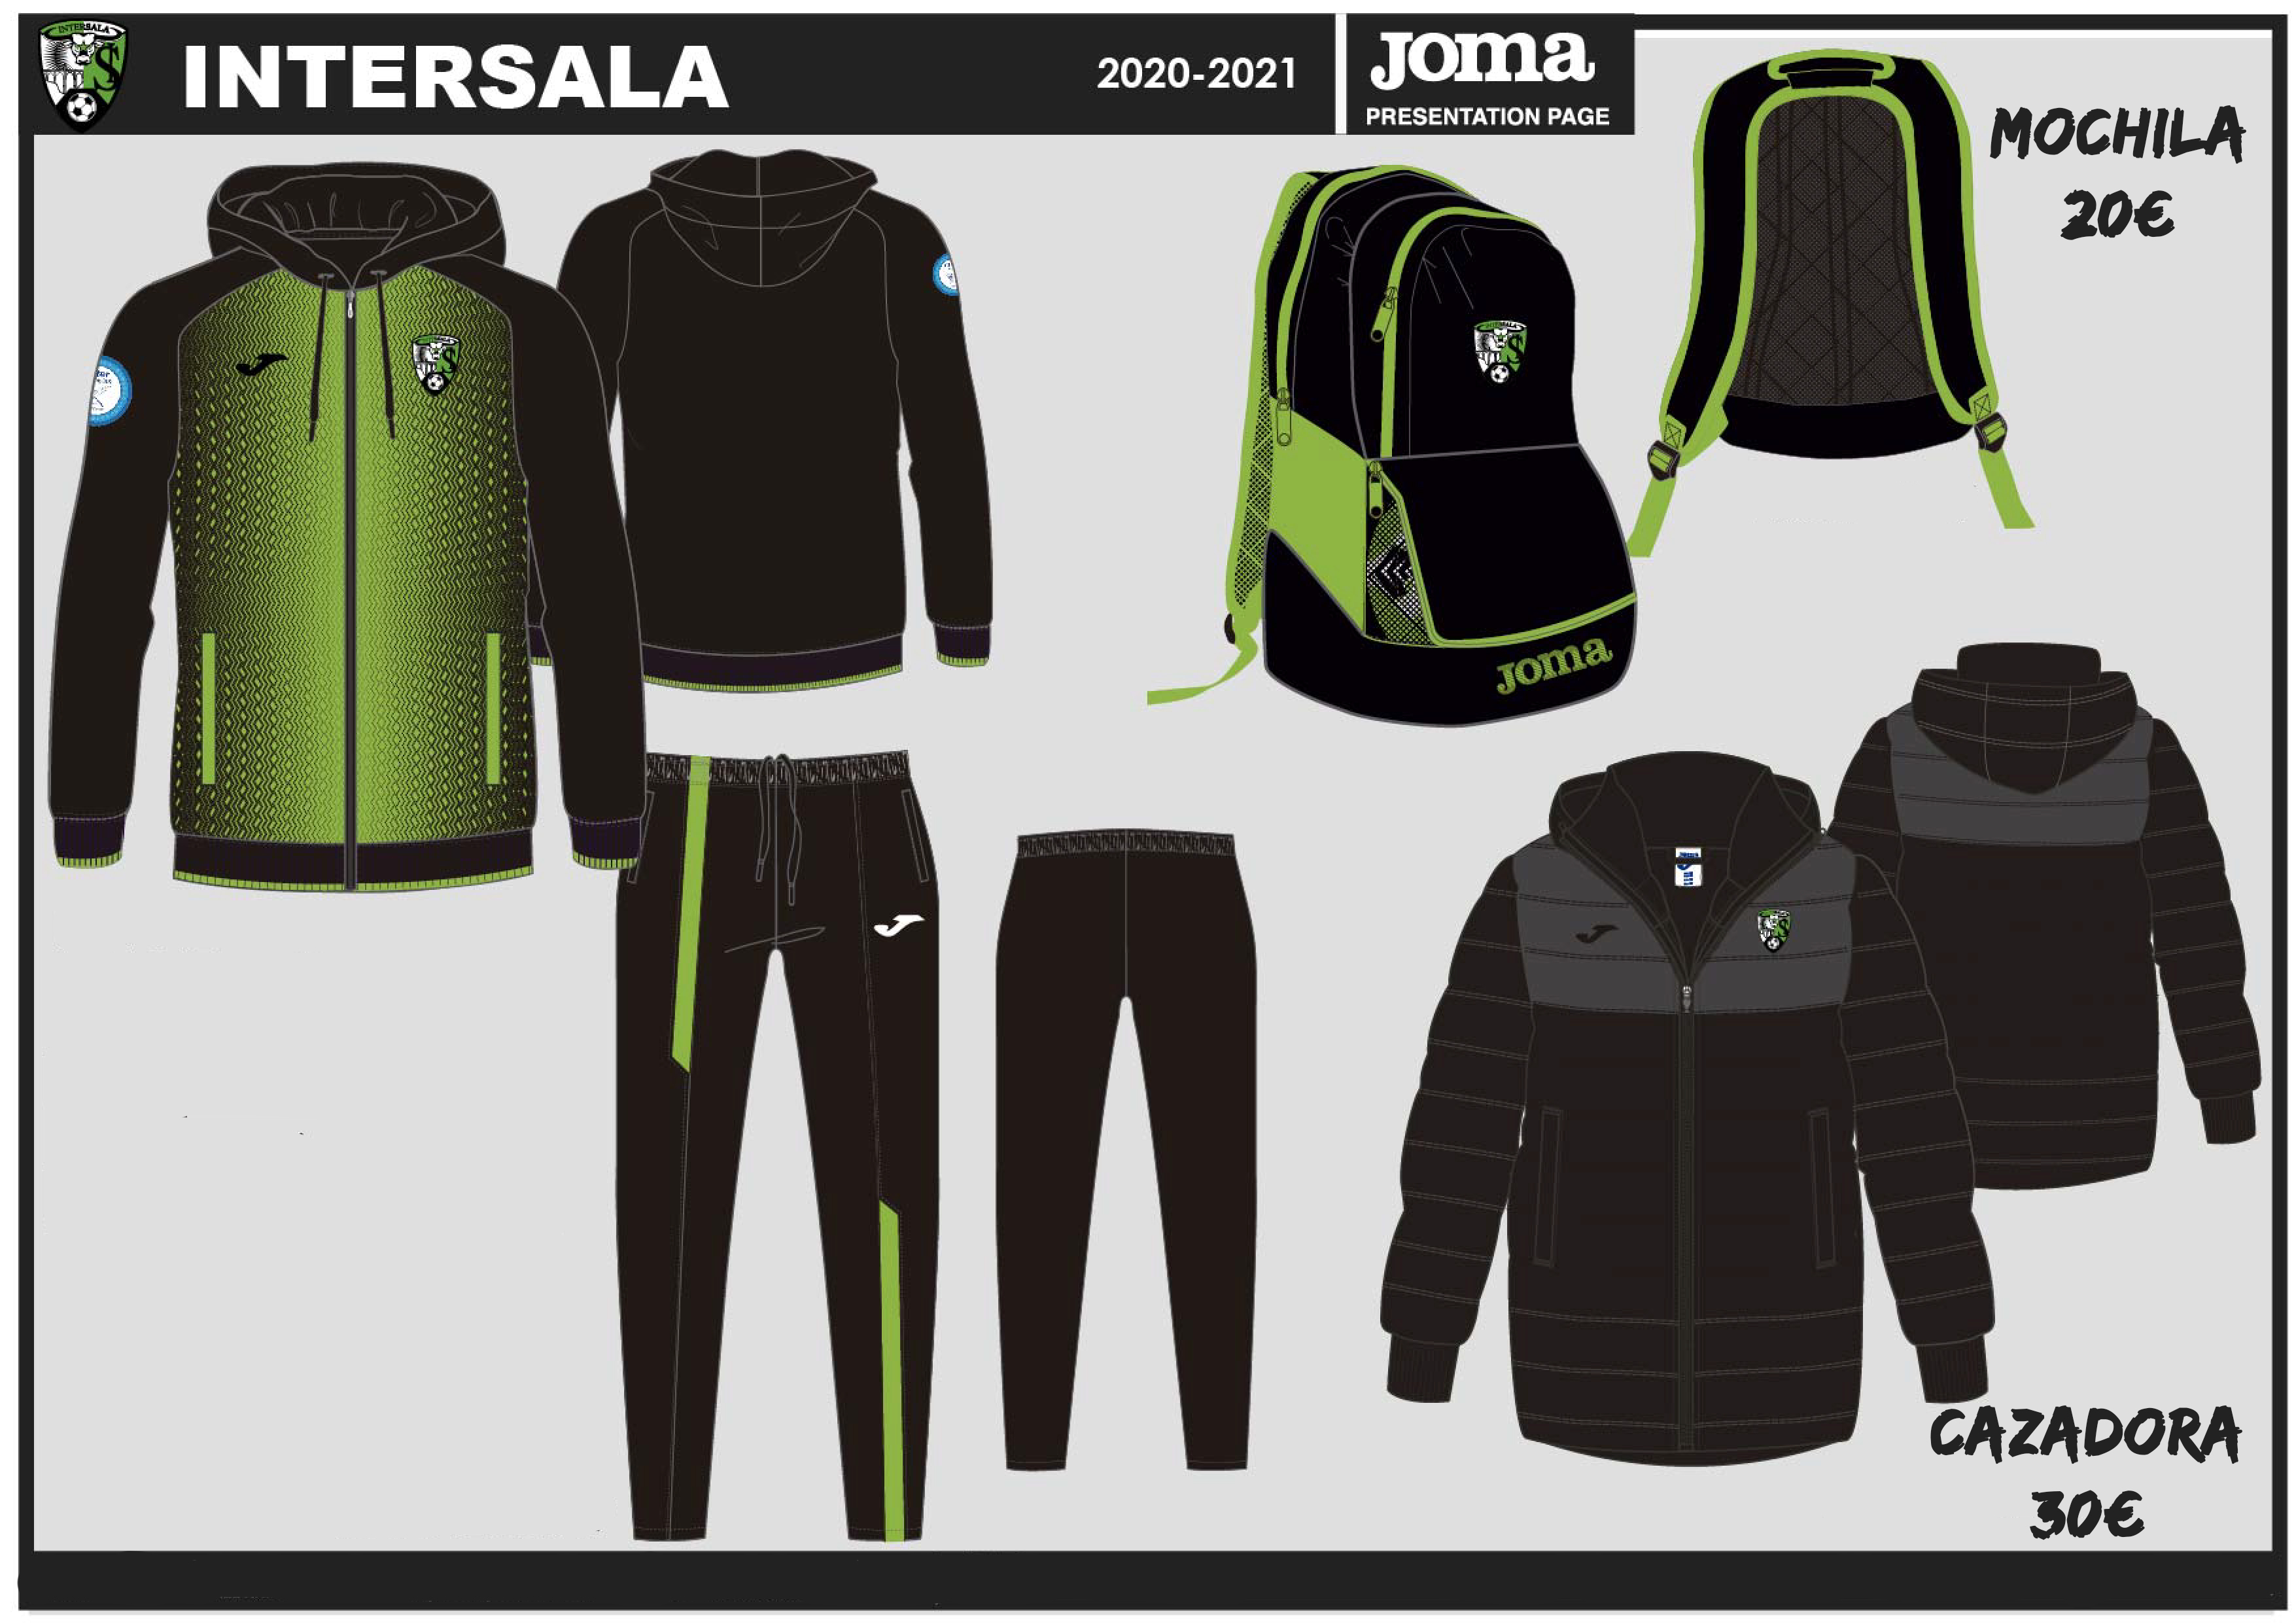 Club deportivo InterSala   www.intersala.es